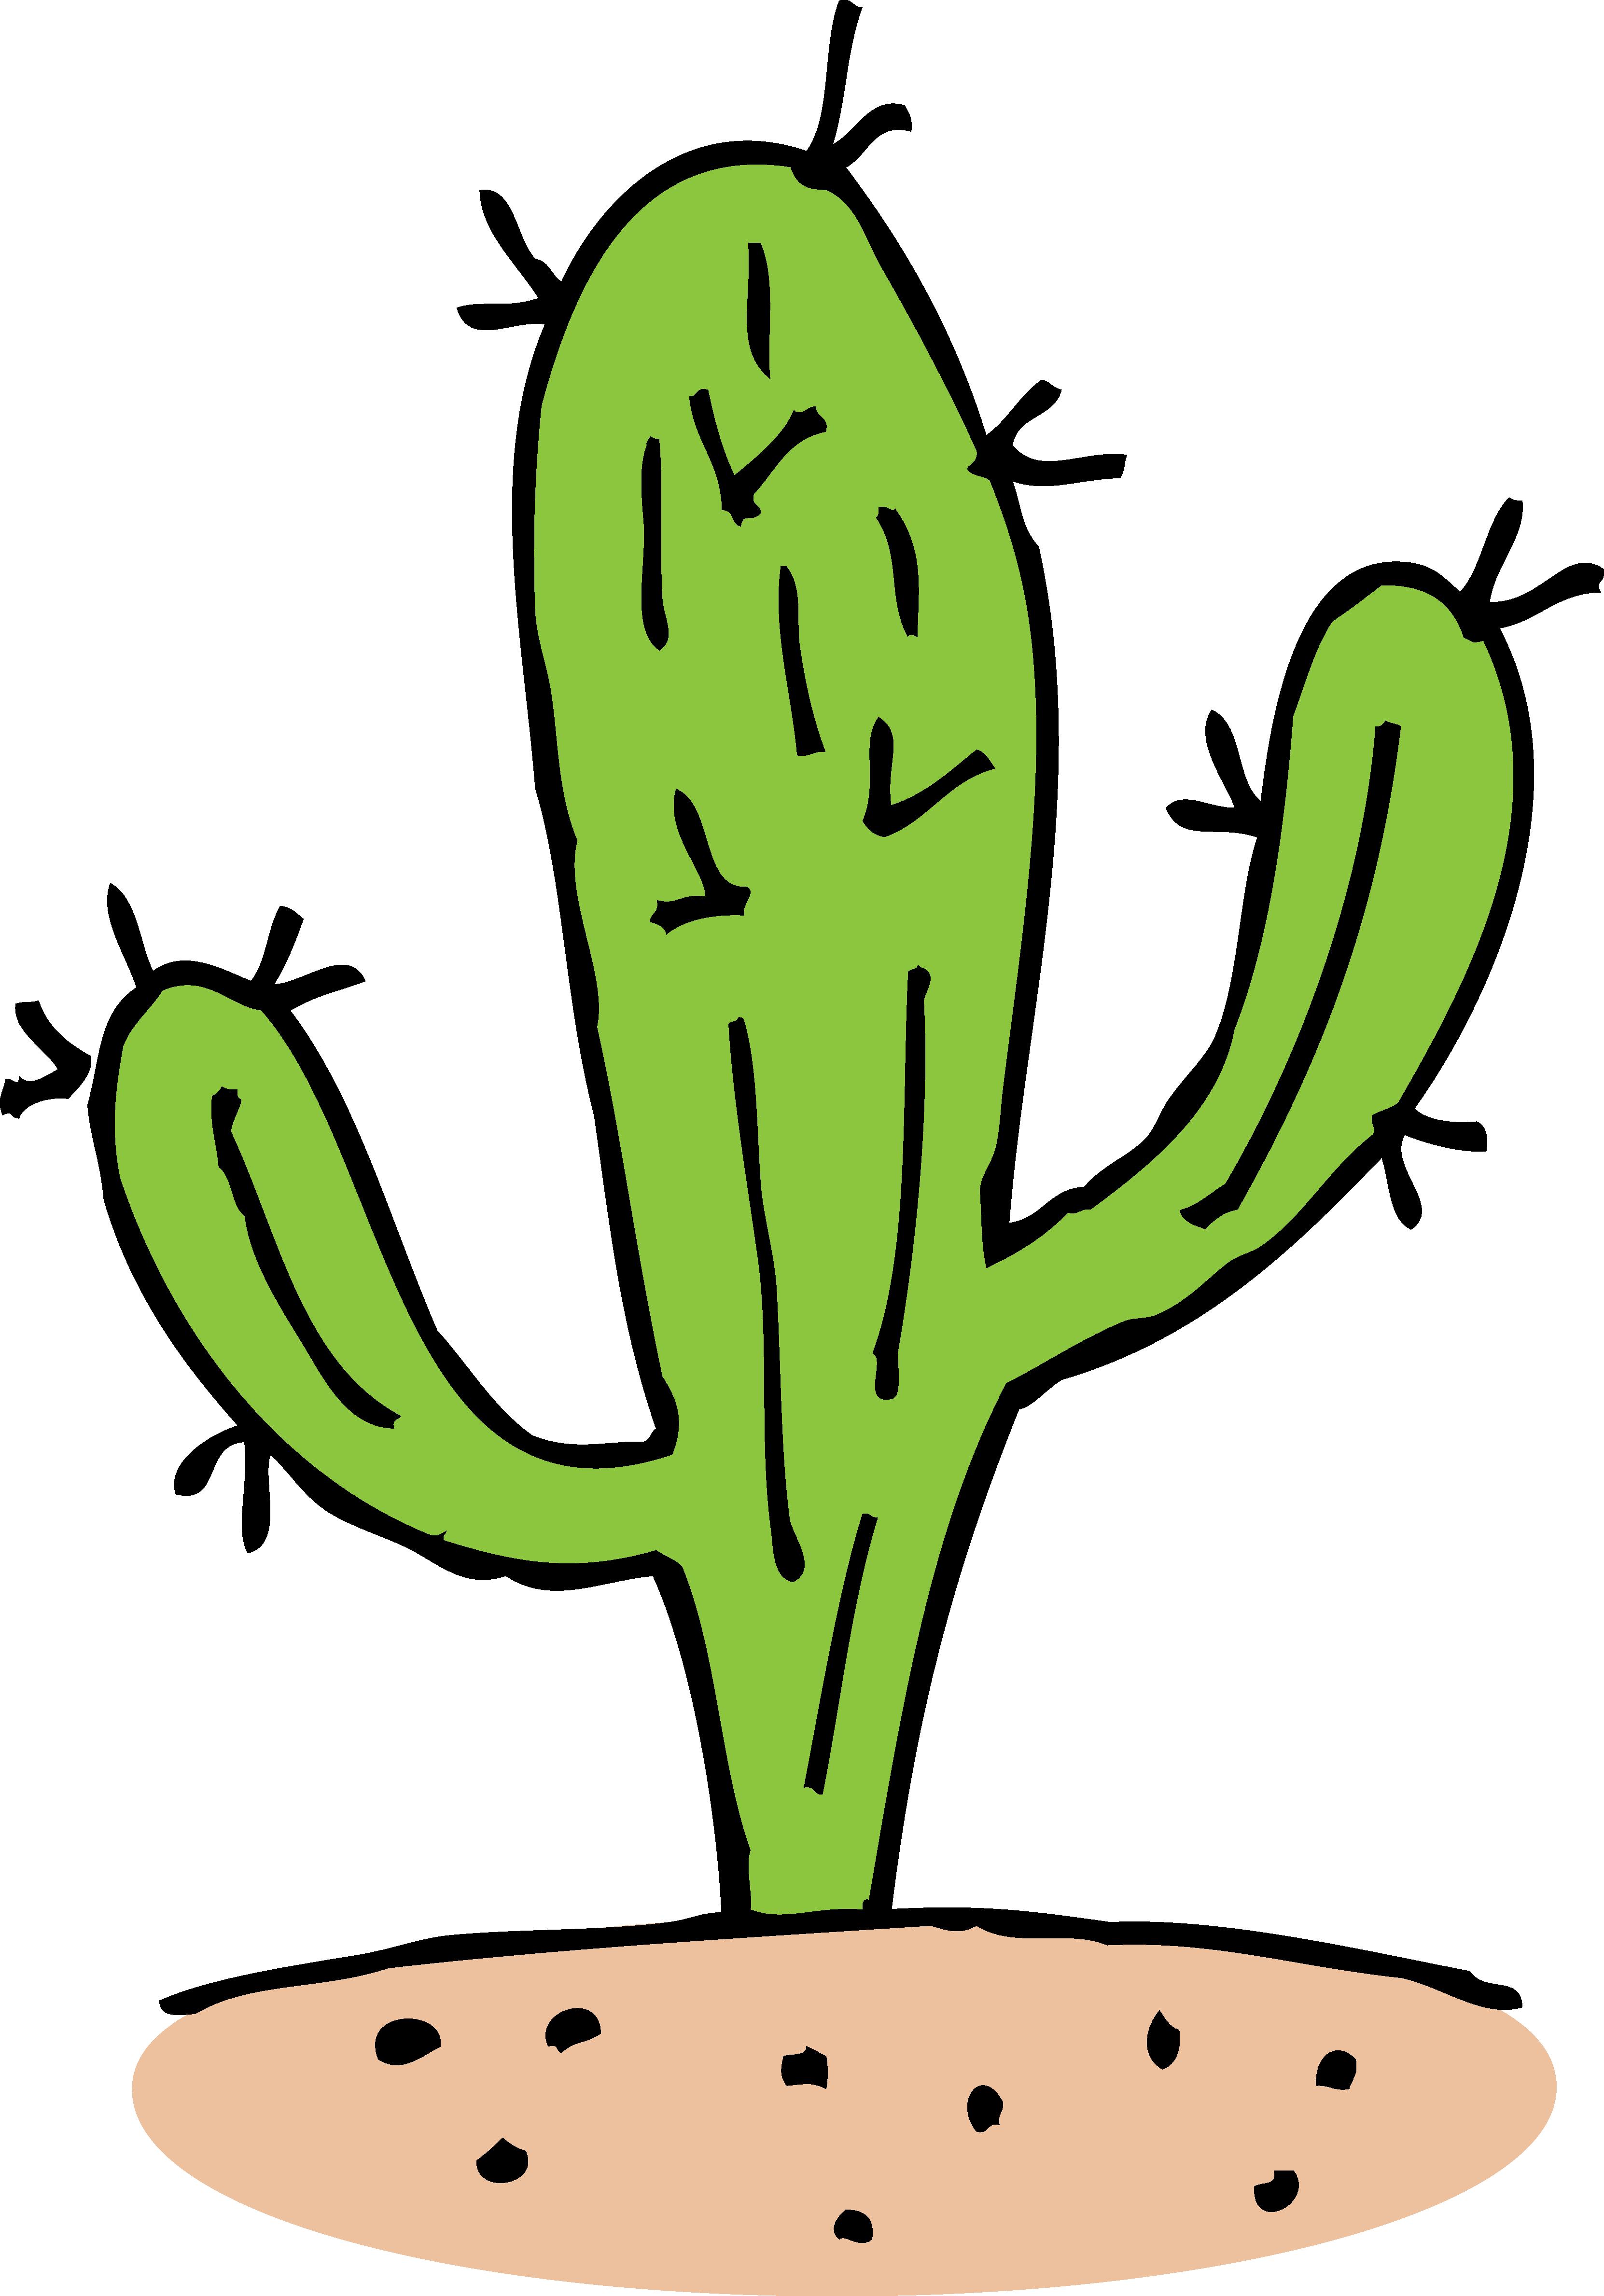 svg library stock Free Cartoon Cactus